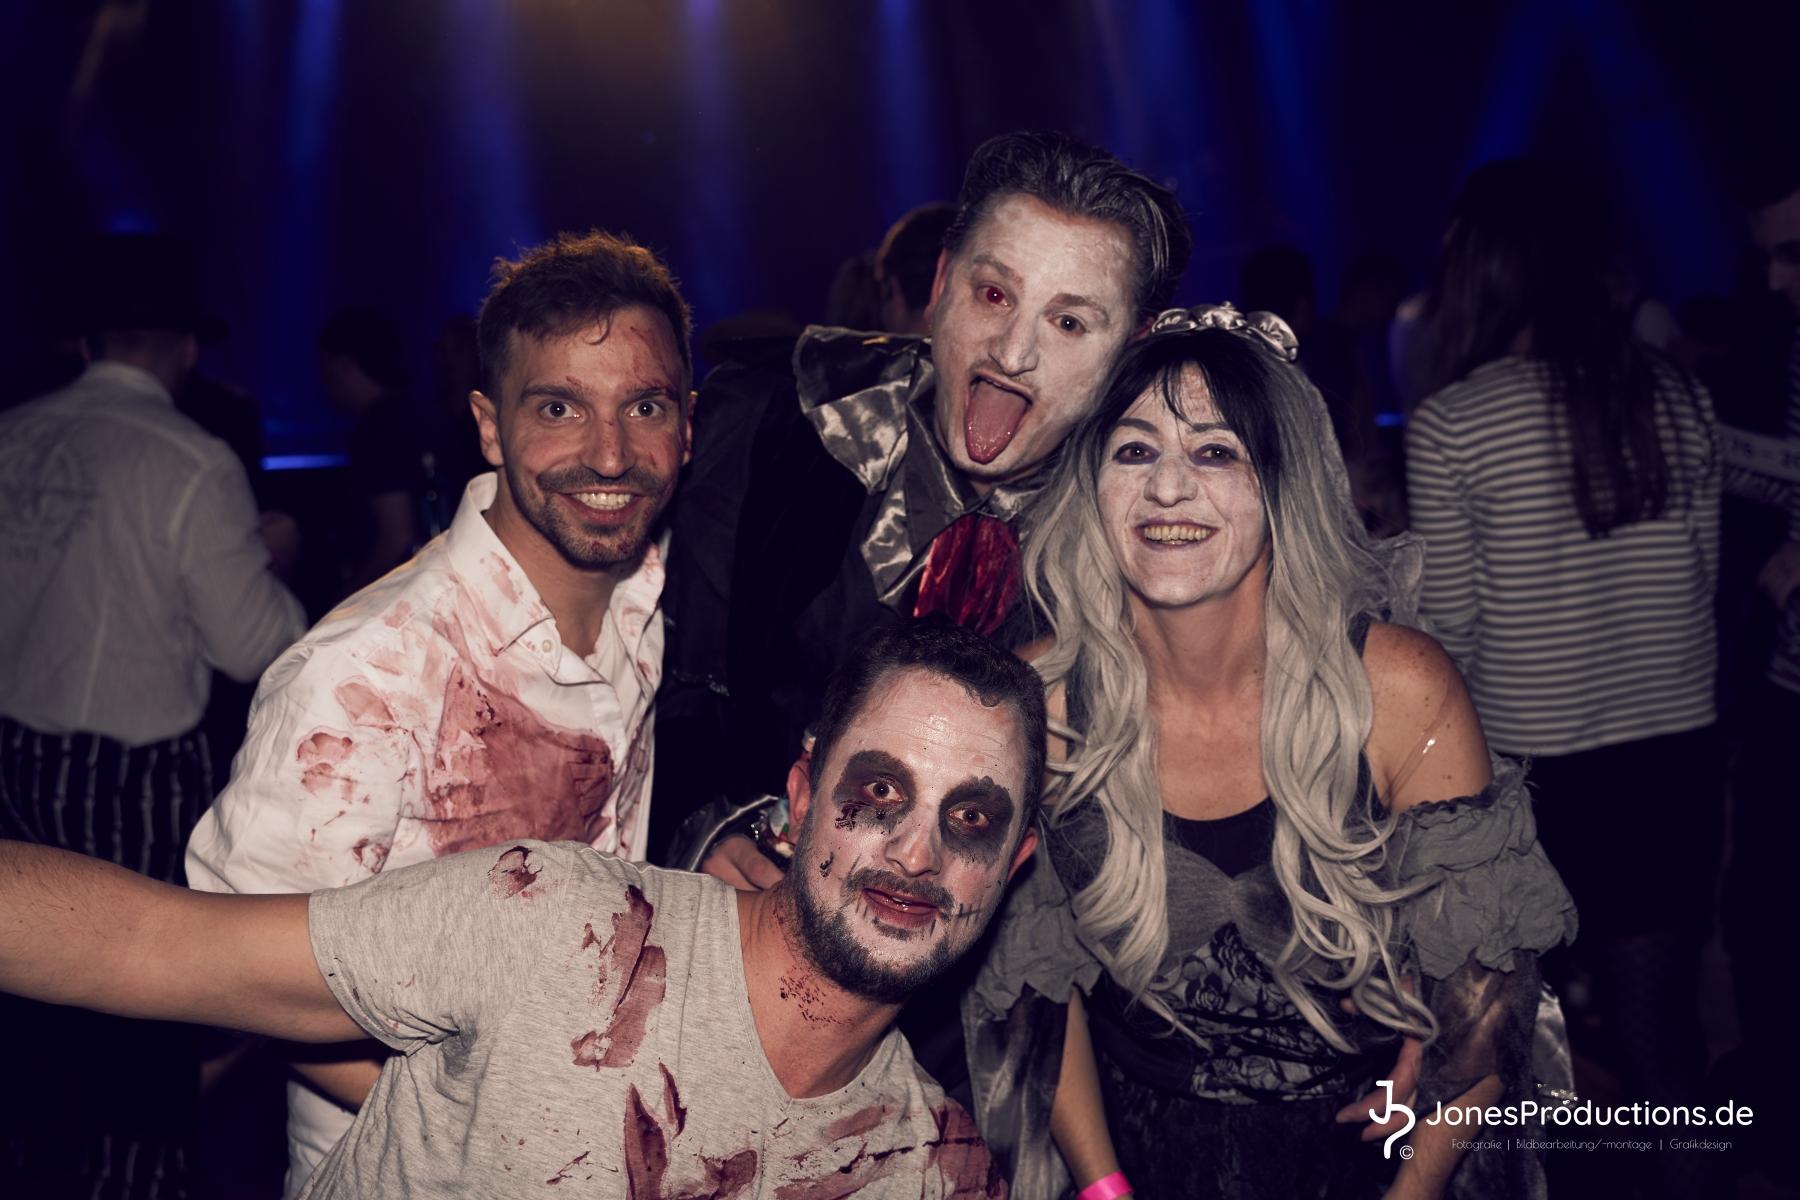 454-Halloween-2019-BSV-Phönix-Sinzehim